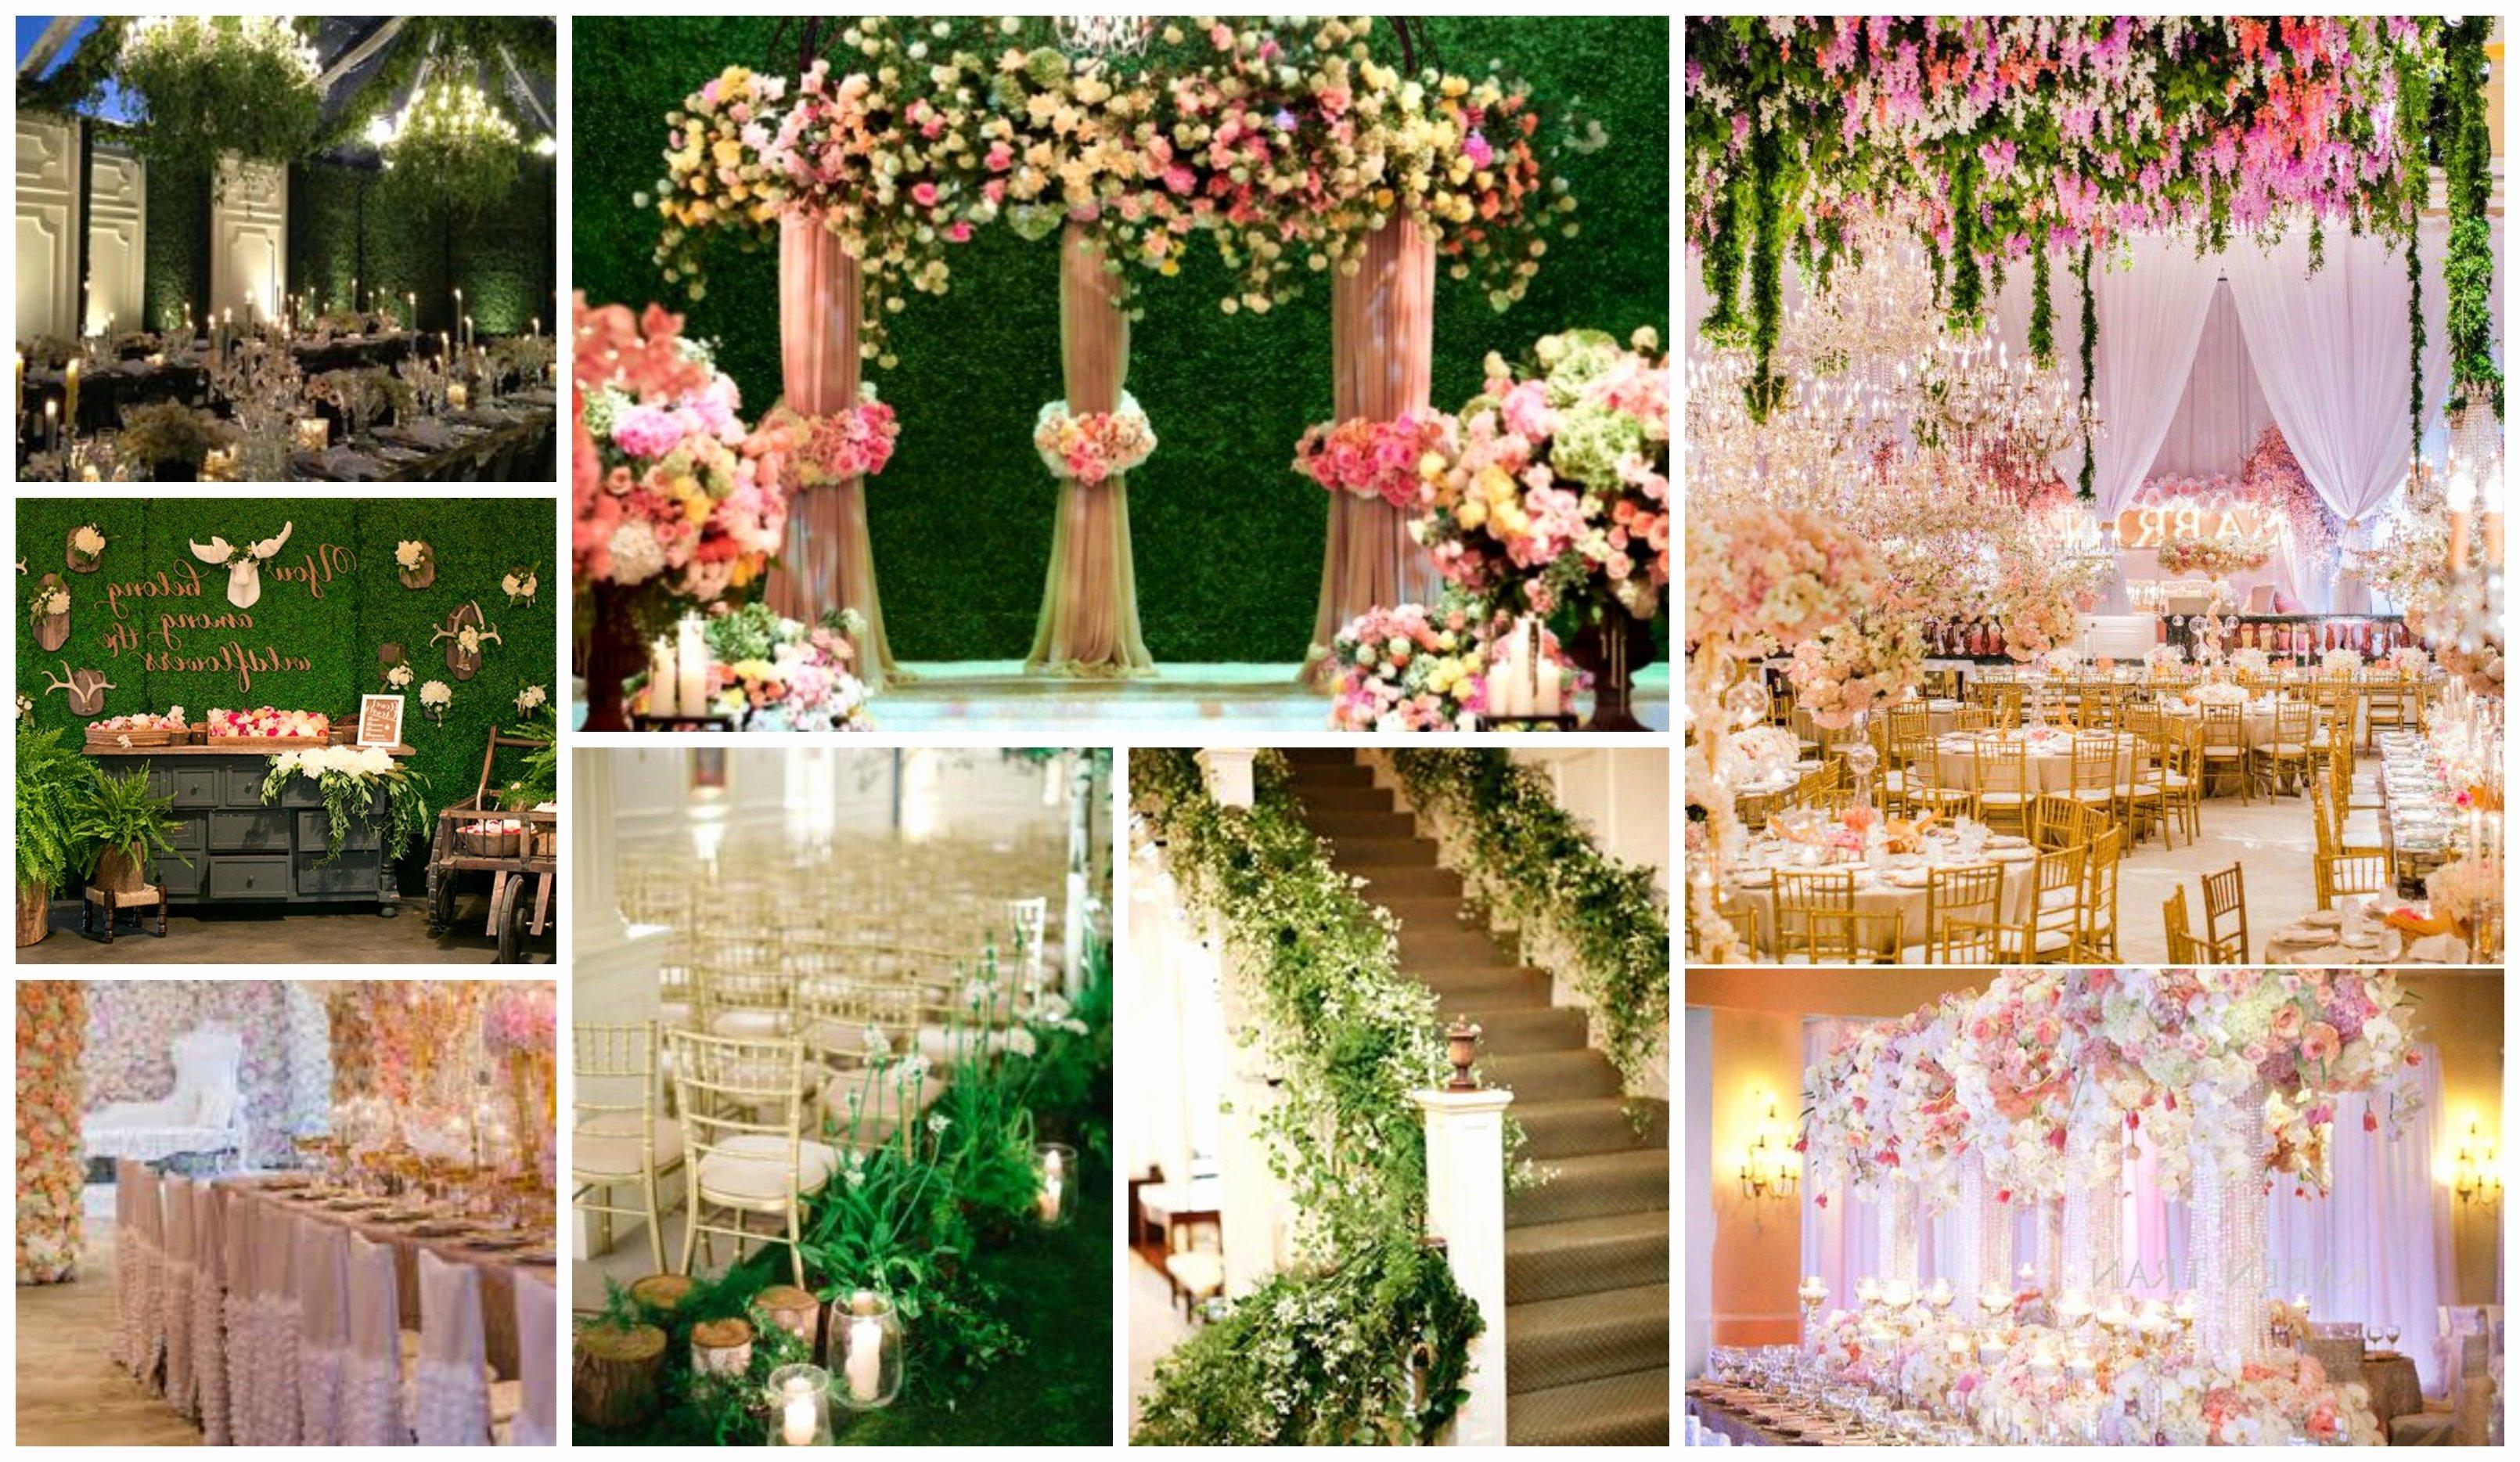 10 Stylish Outside Wedding Ideas For Summer 43 inspirational outdoor wedding themes wedding idea